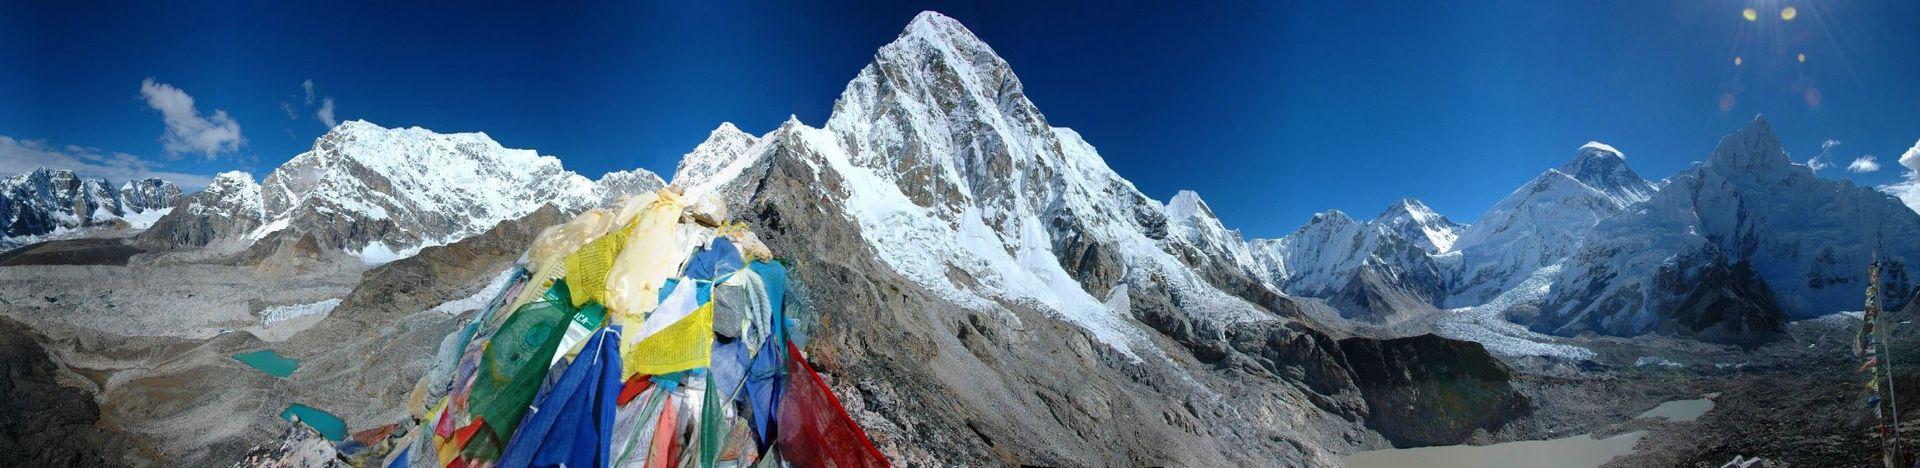 widok na Pumori - Mount Everest - trekking - Himalaje - Nepal - 4challenge